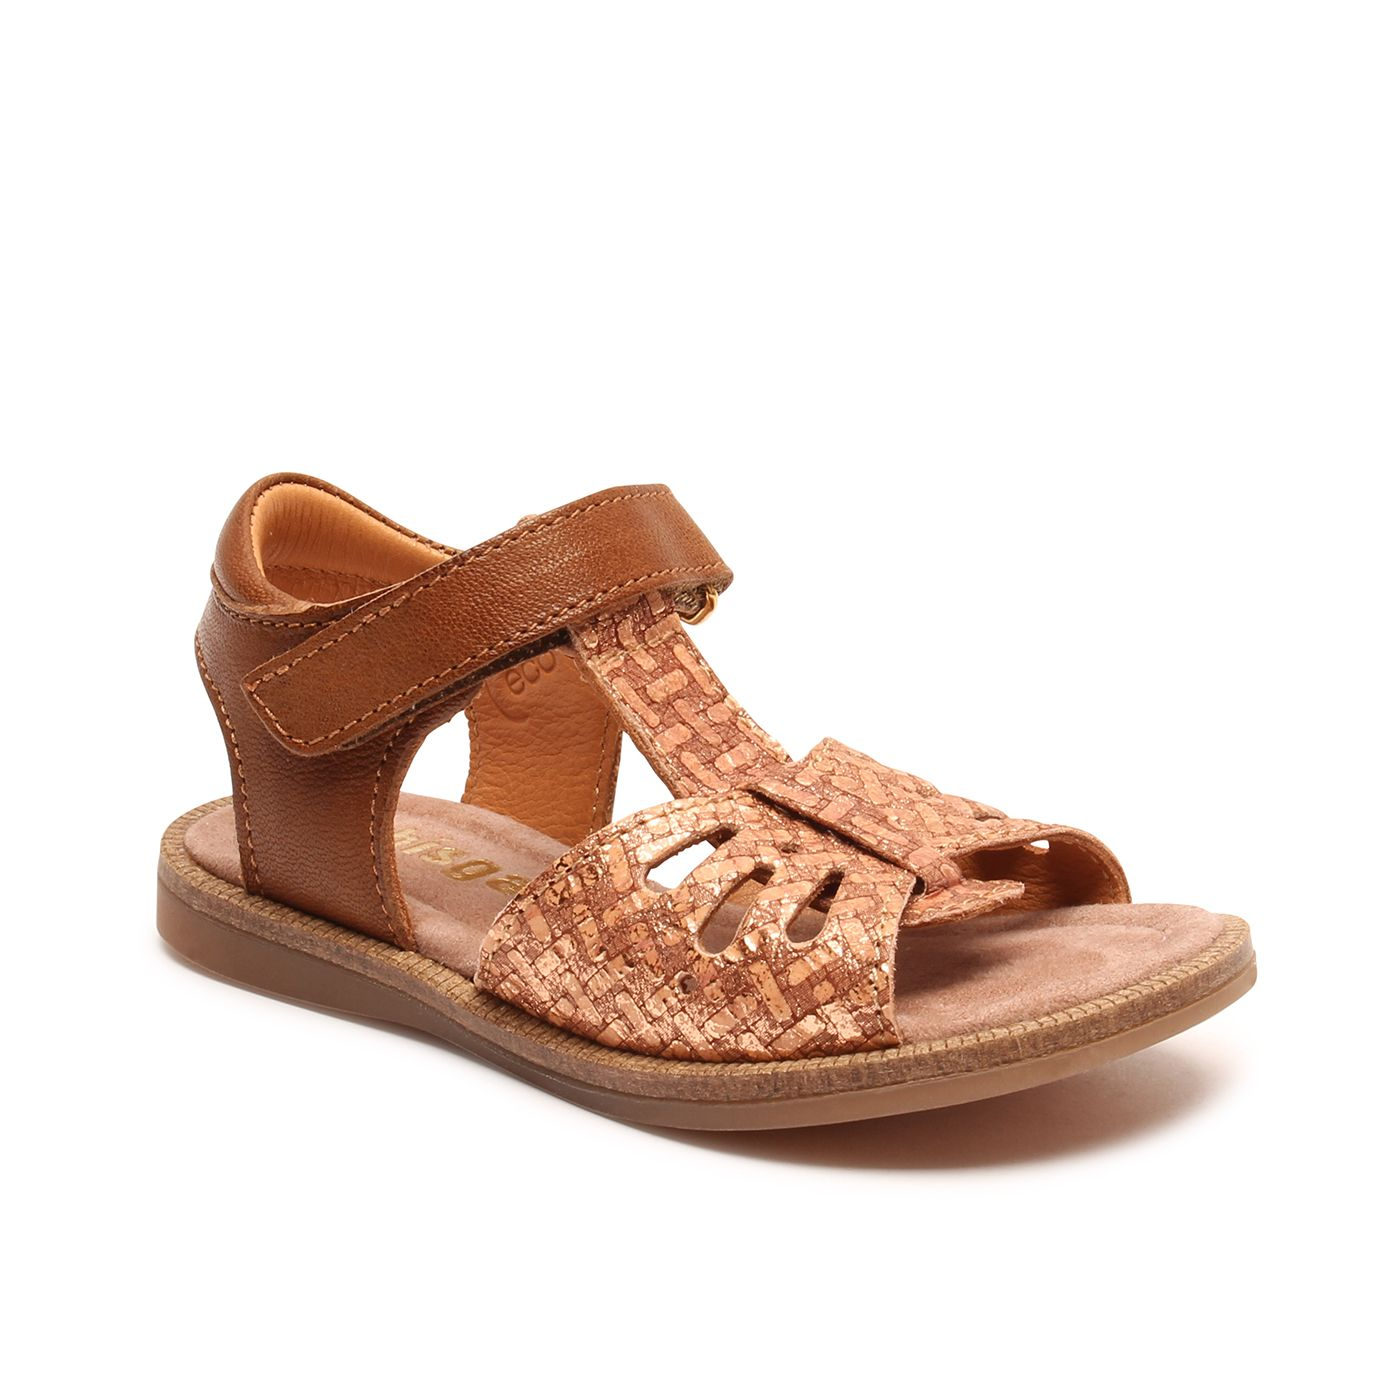 Bisgaard dívčí kožené sandály 70291 - 1529